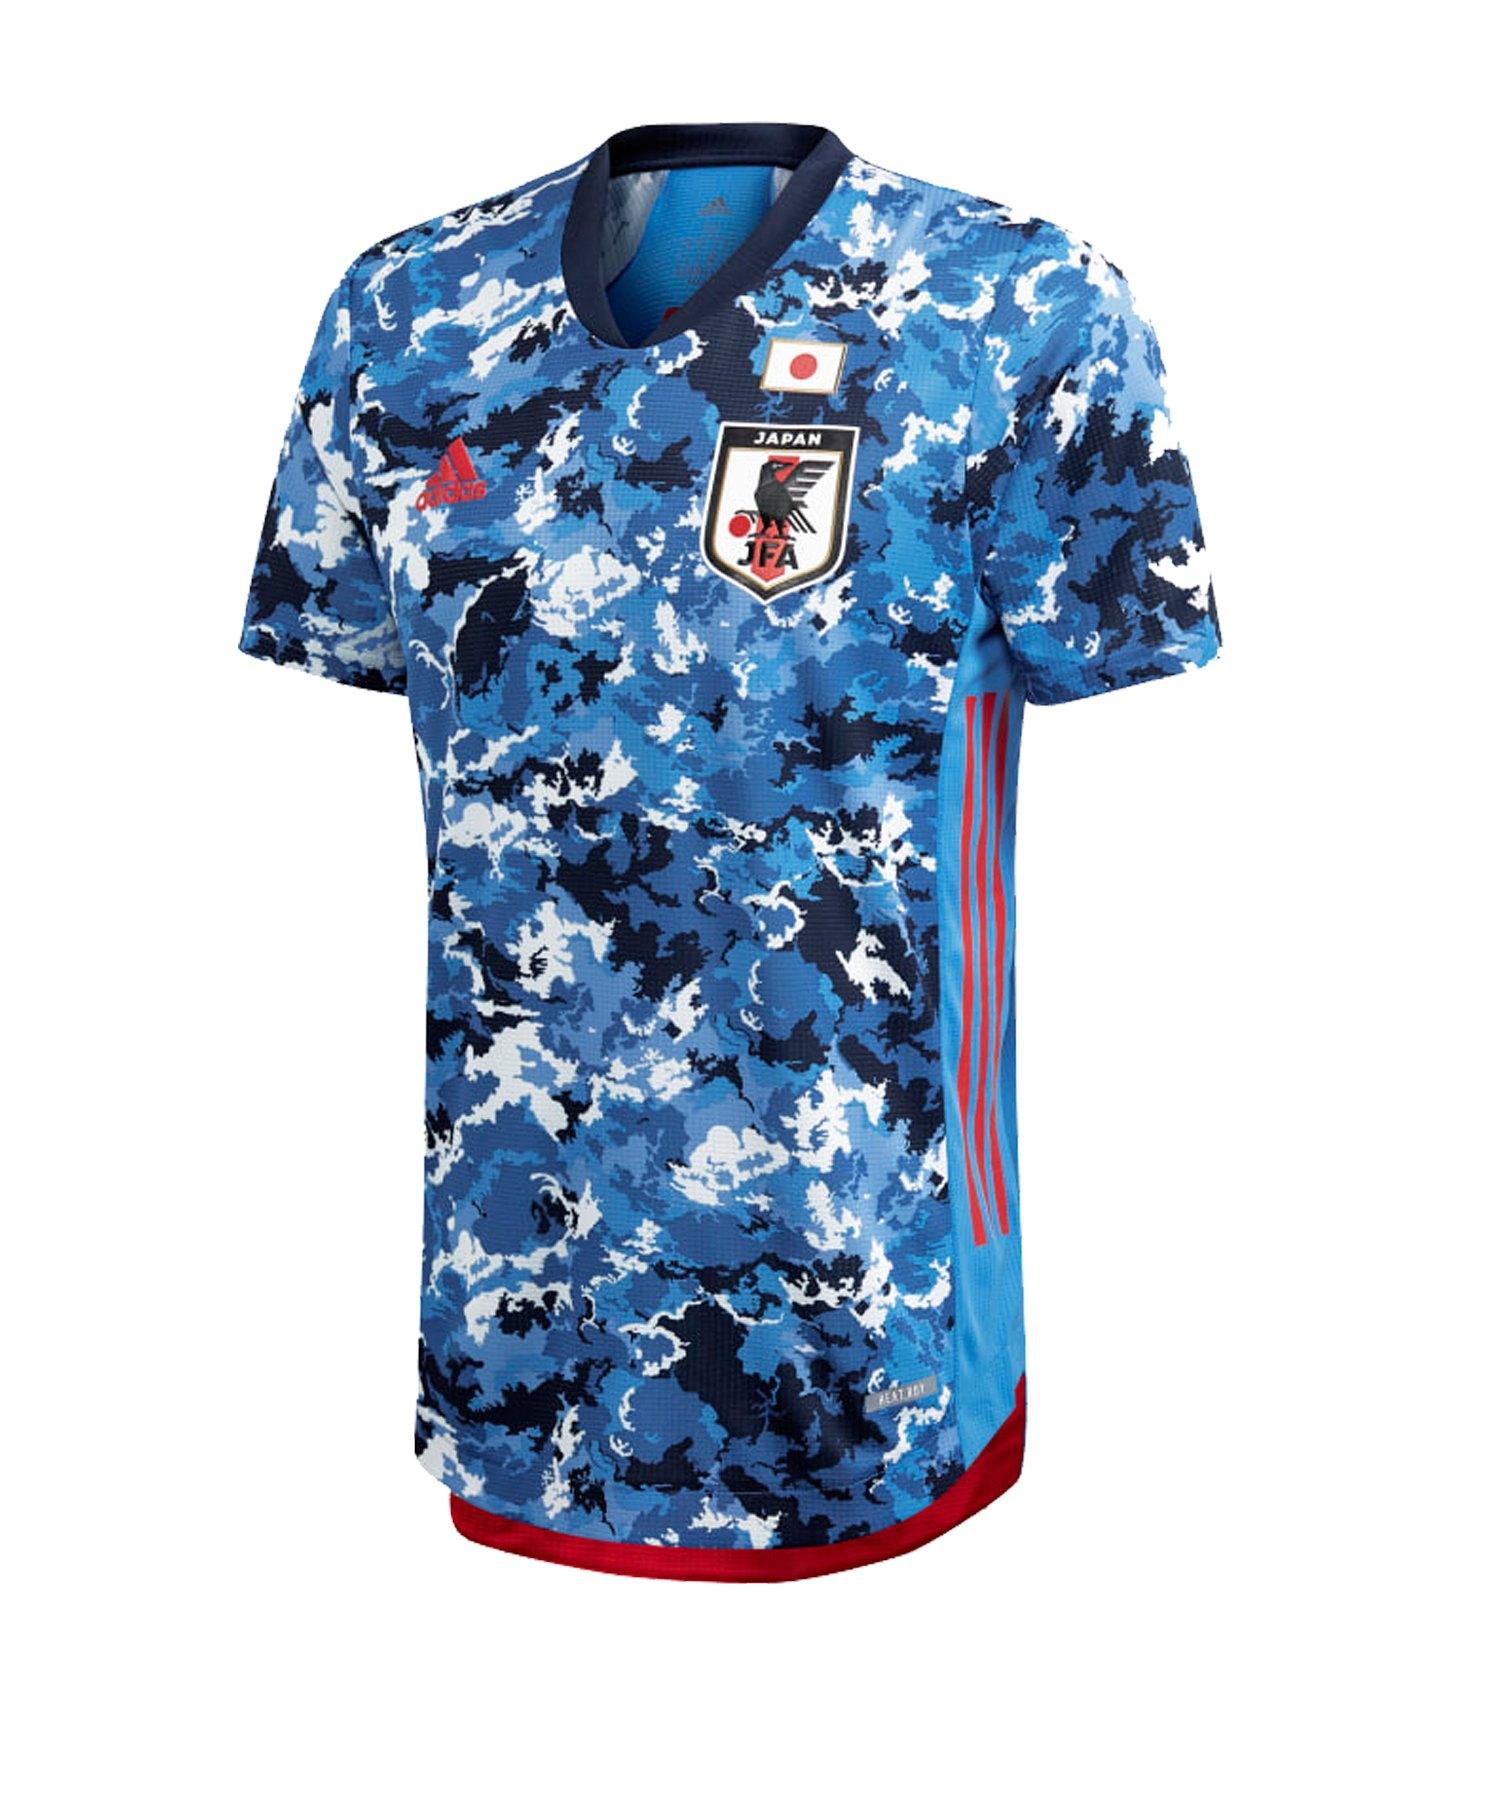 adidas Japan Authentic Trikot Home EM 2020 Blau - blau